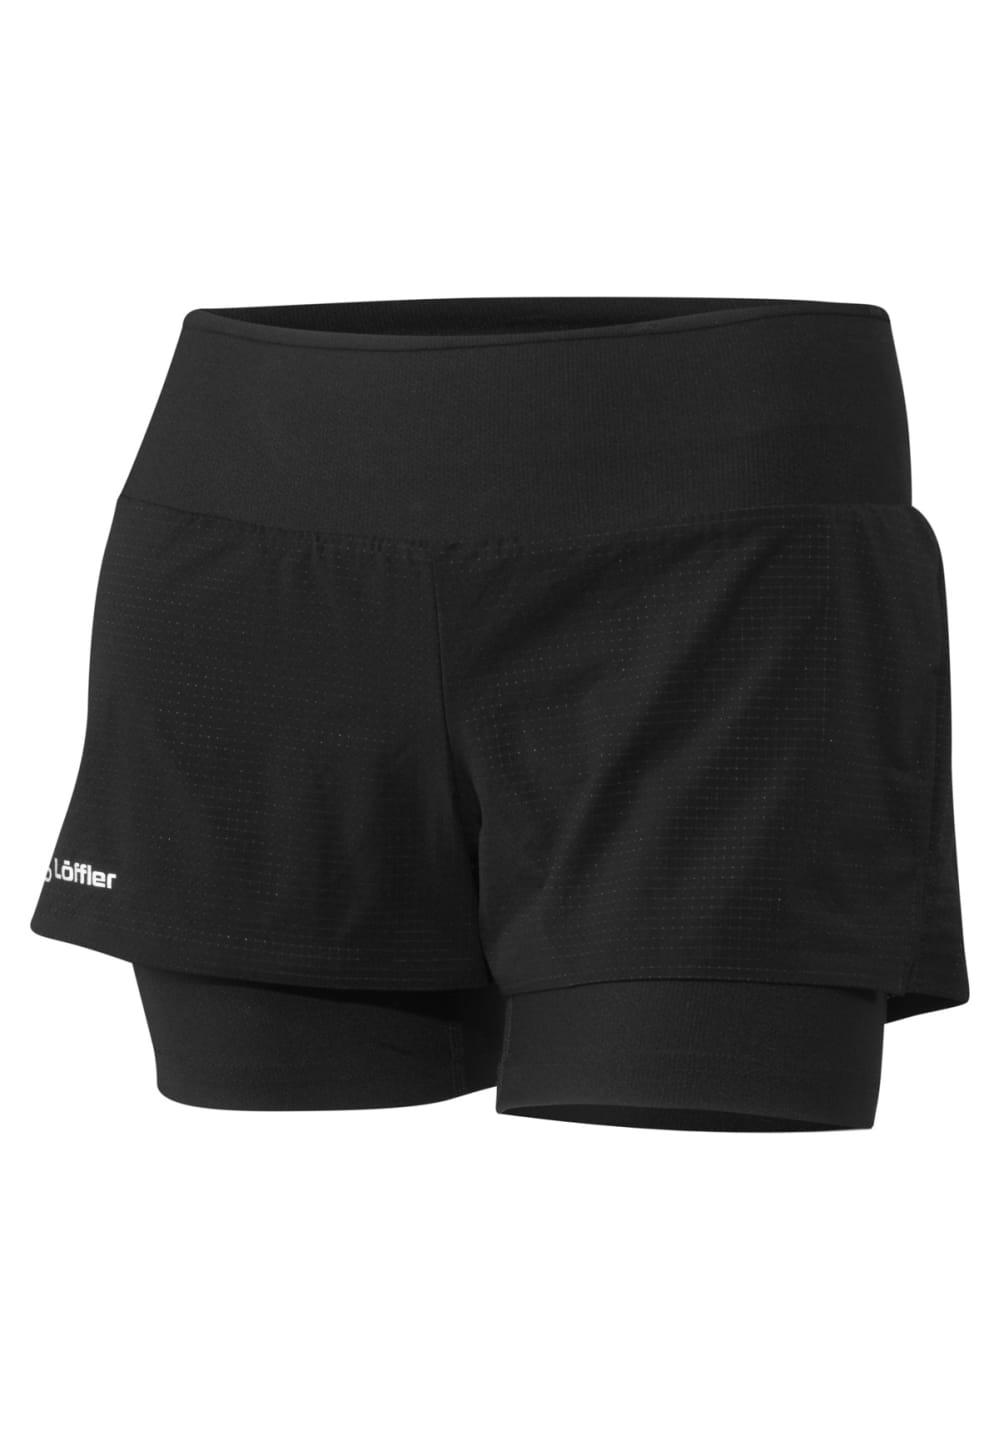 Löffler Funktions-shorts 2in1 - Laufhosen für Damen - Grau, Gr. 38